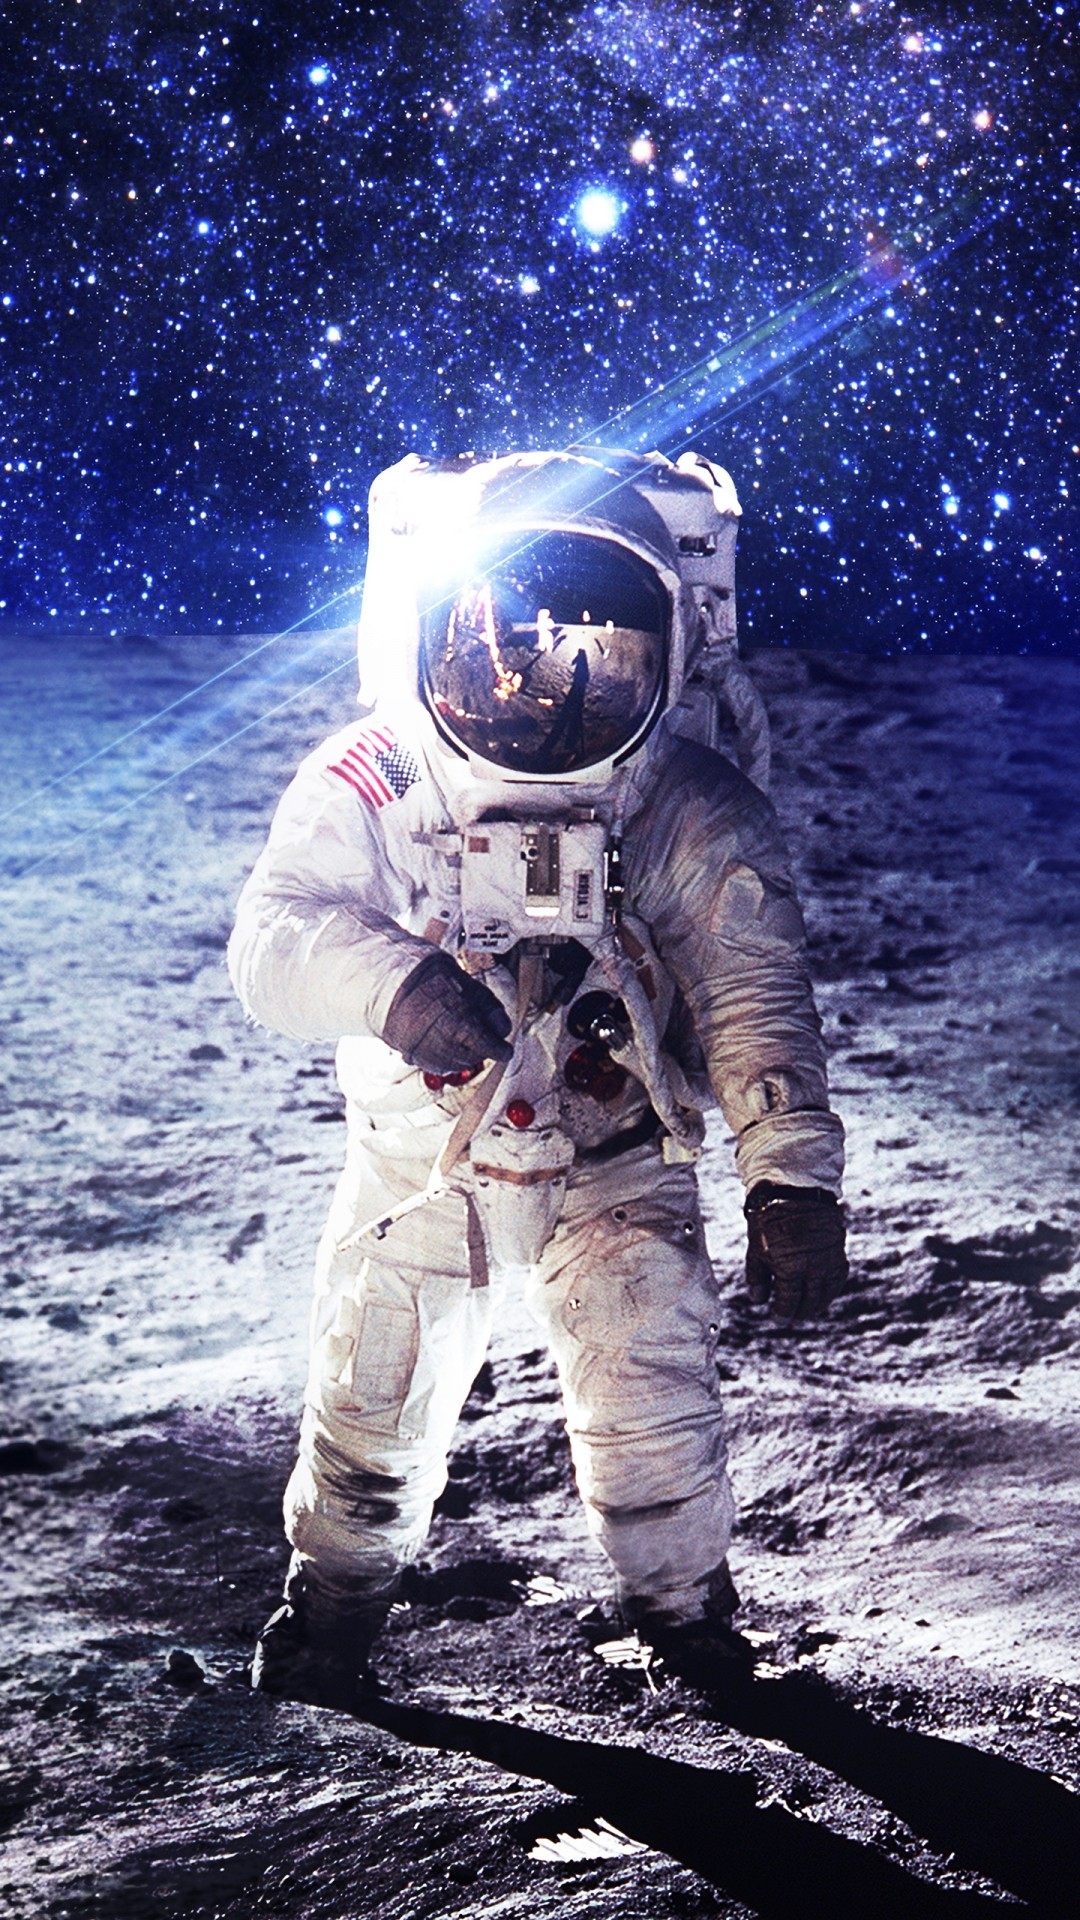 Astronaut Iphone Wallpaper Nasa Astronaut On Moon 4k Wallpapers Hd Wallpapers Id